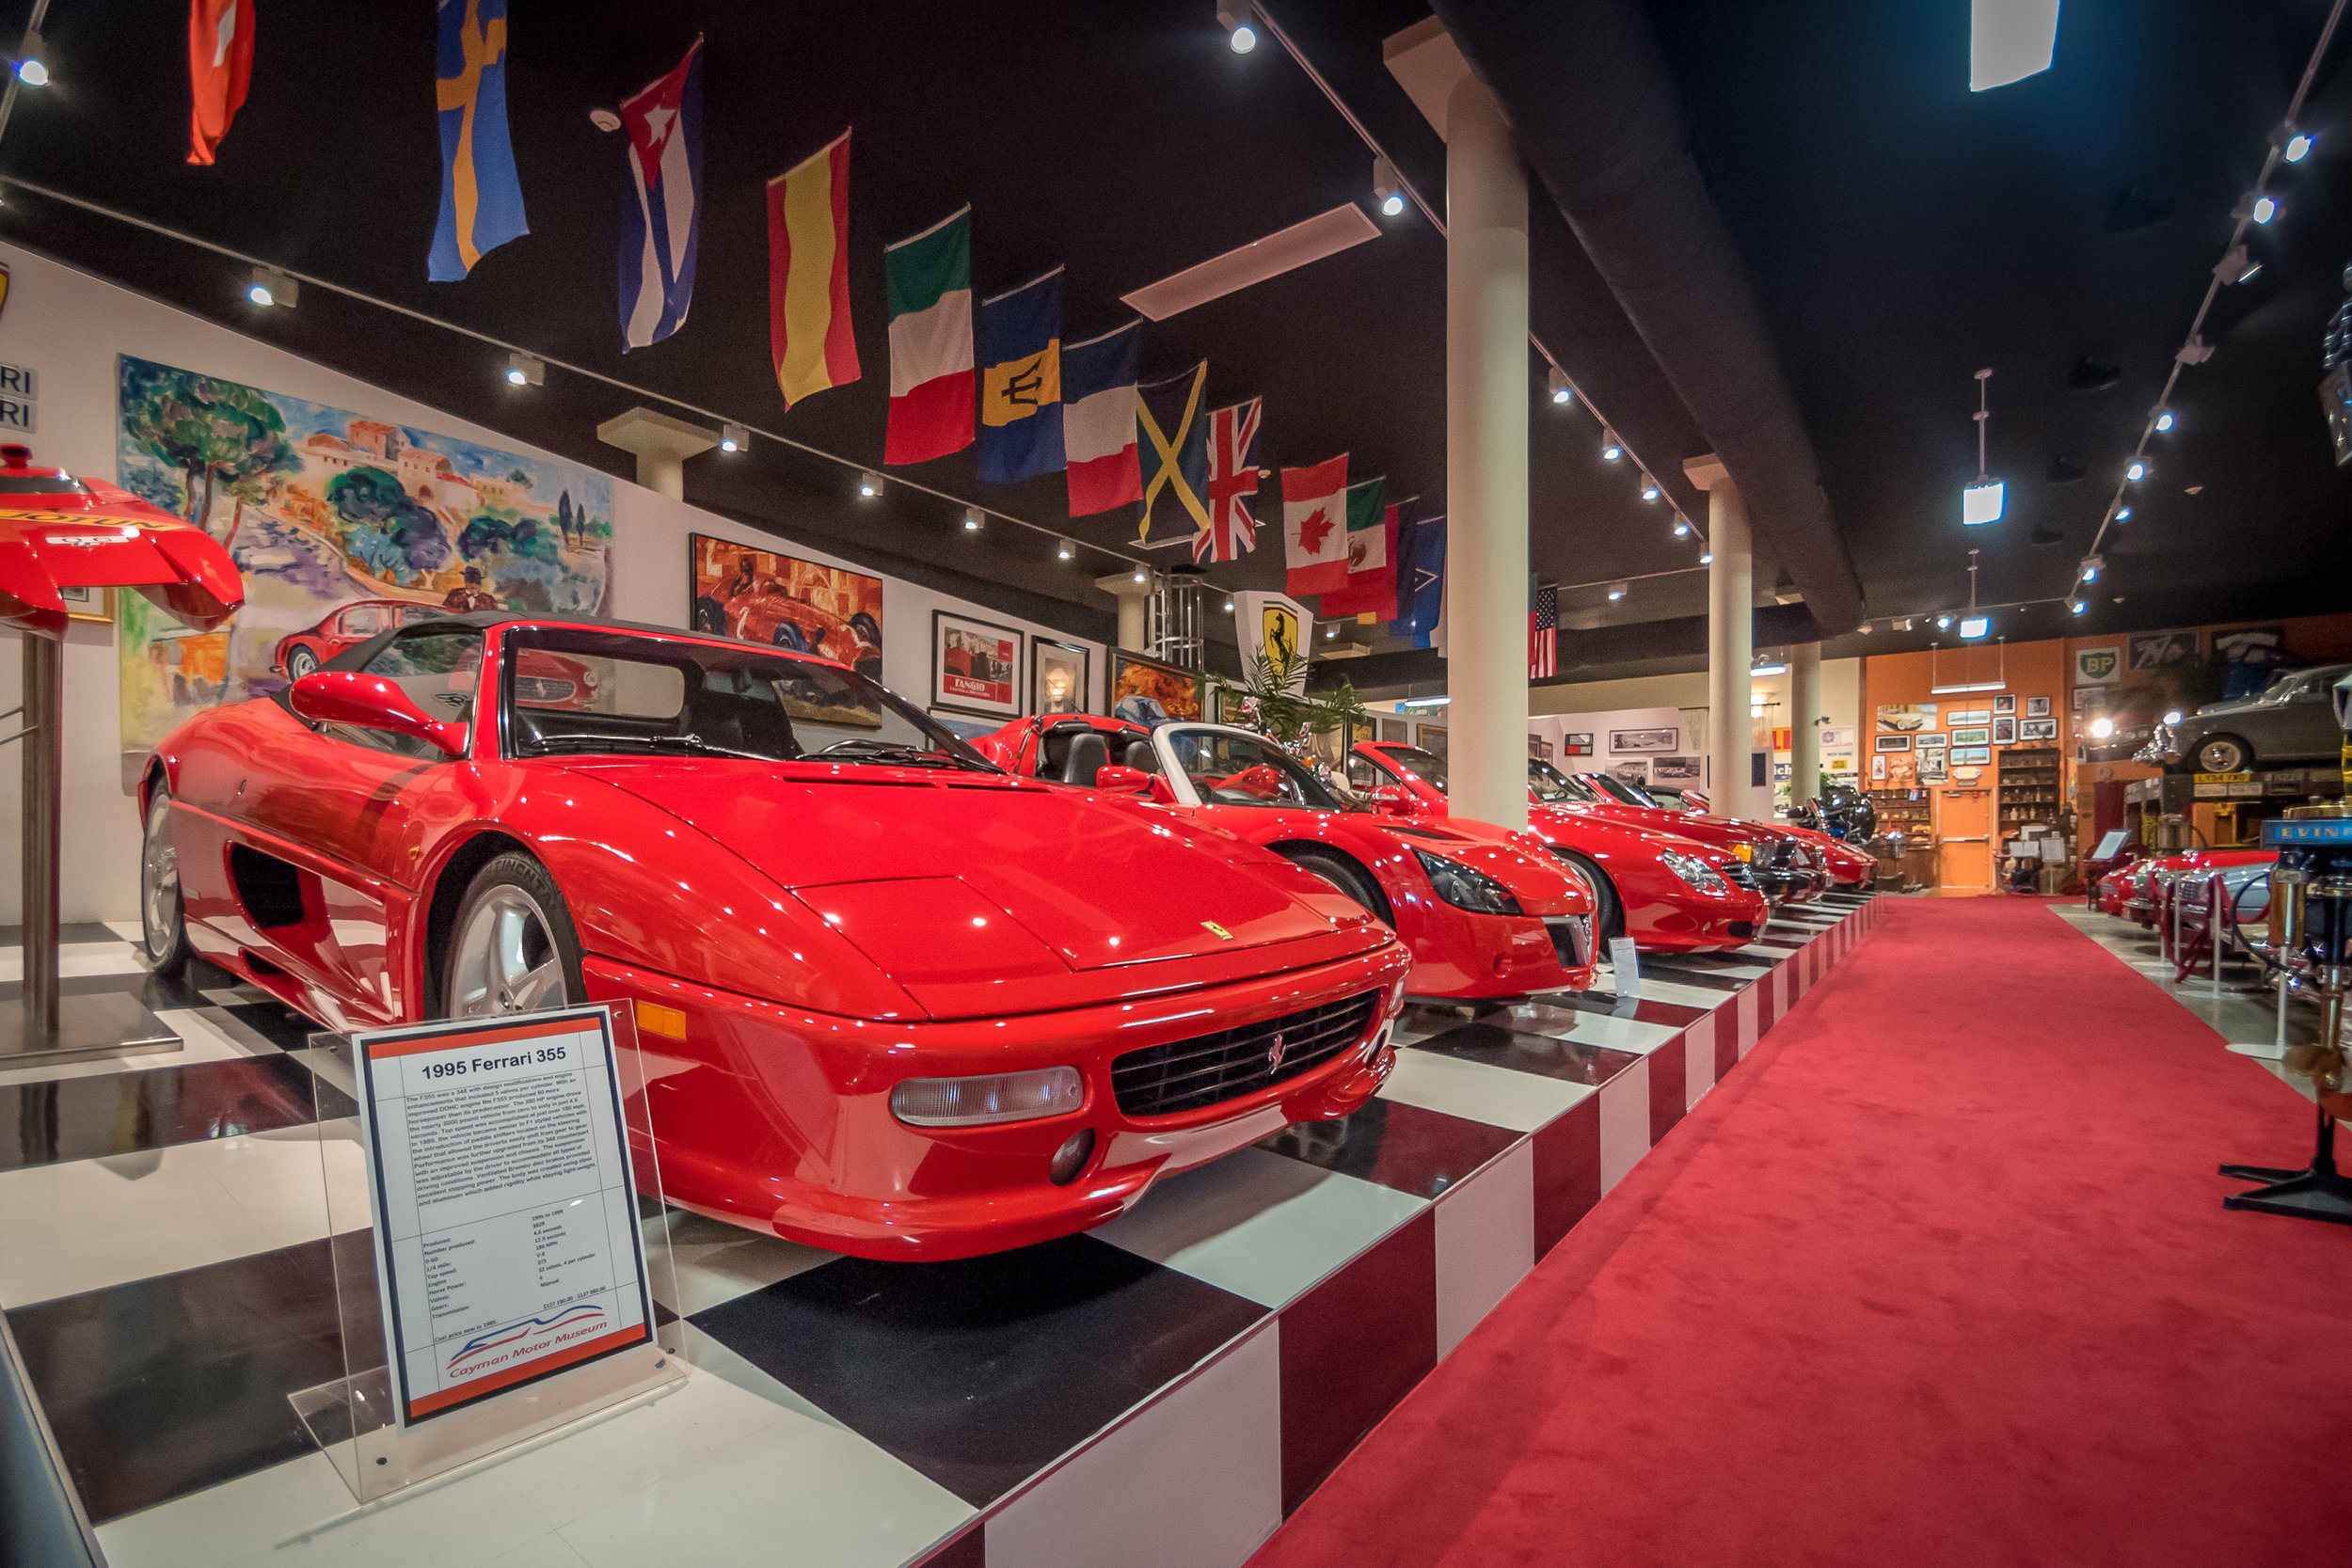 Cayman_Motor_Museum-1.jpg